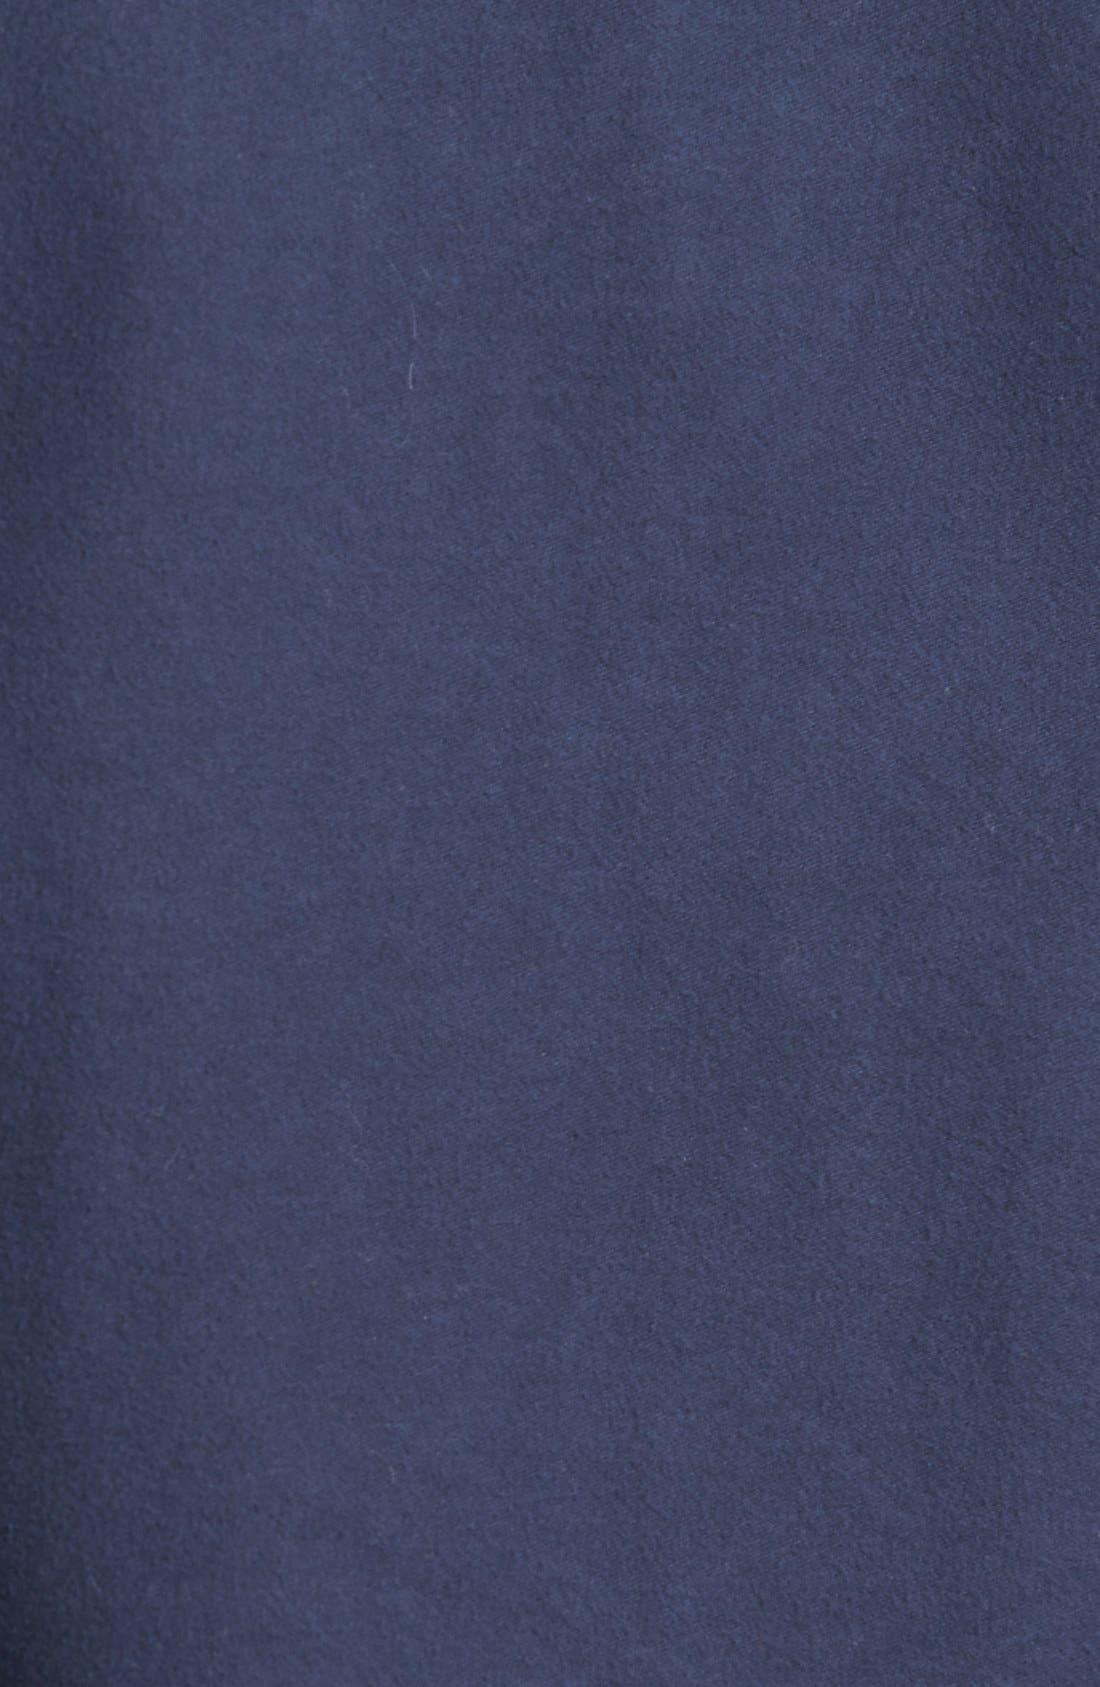 Alternate Image 3  - Insight 'Live Well' Work Shirt